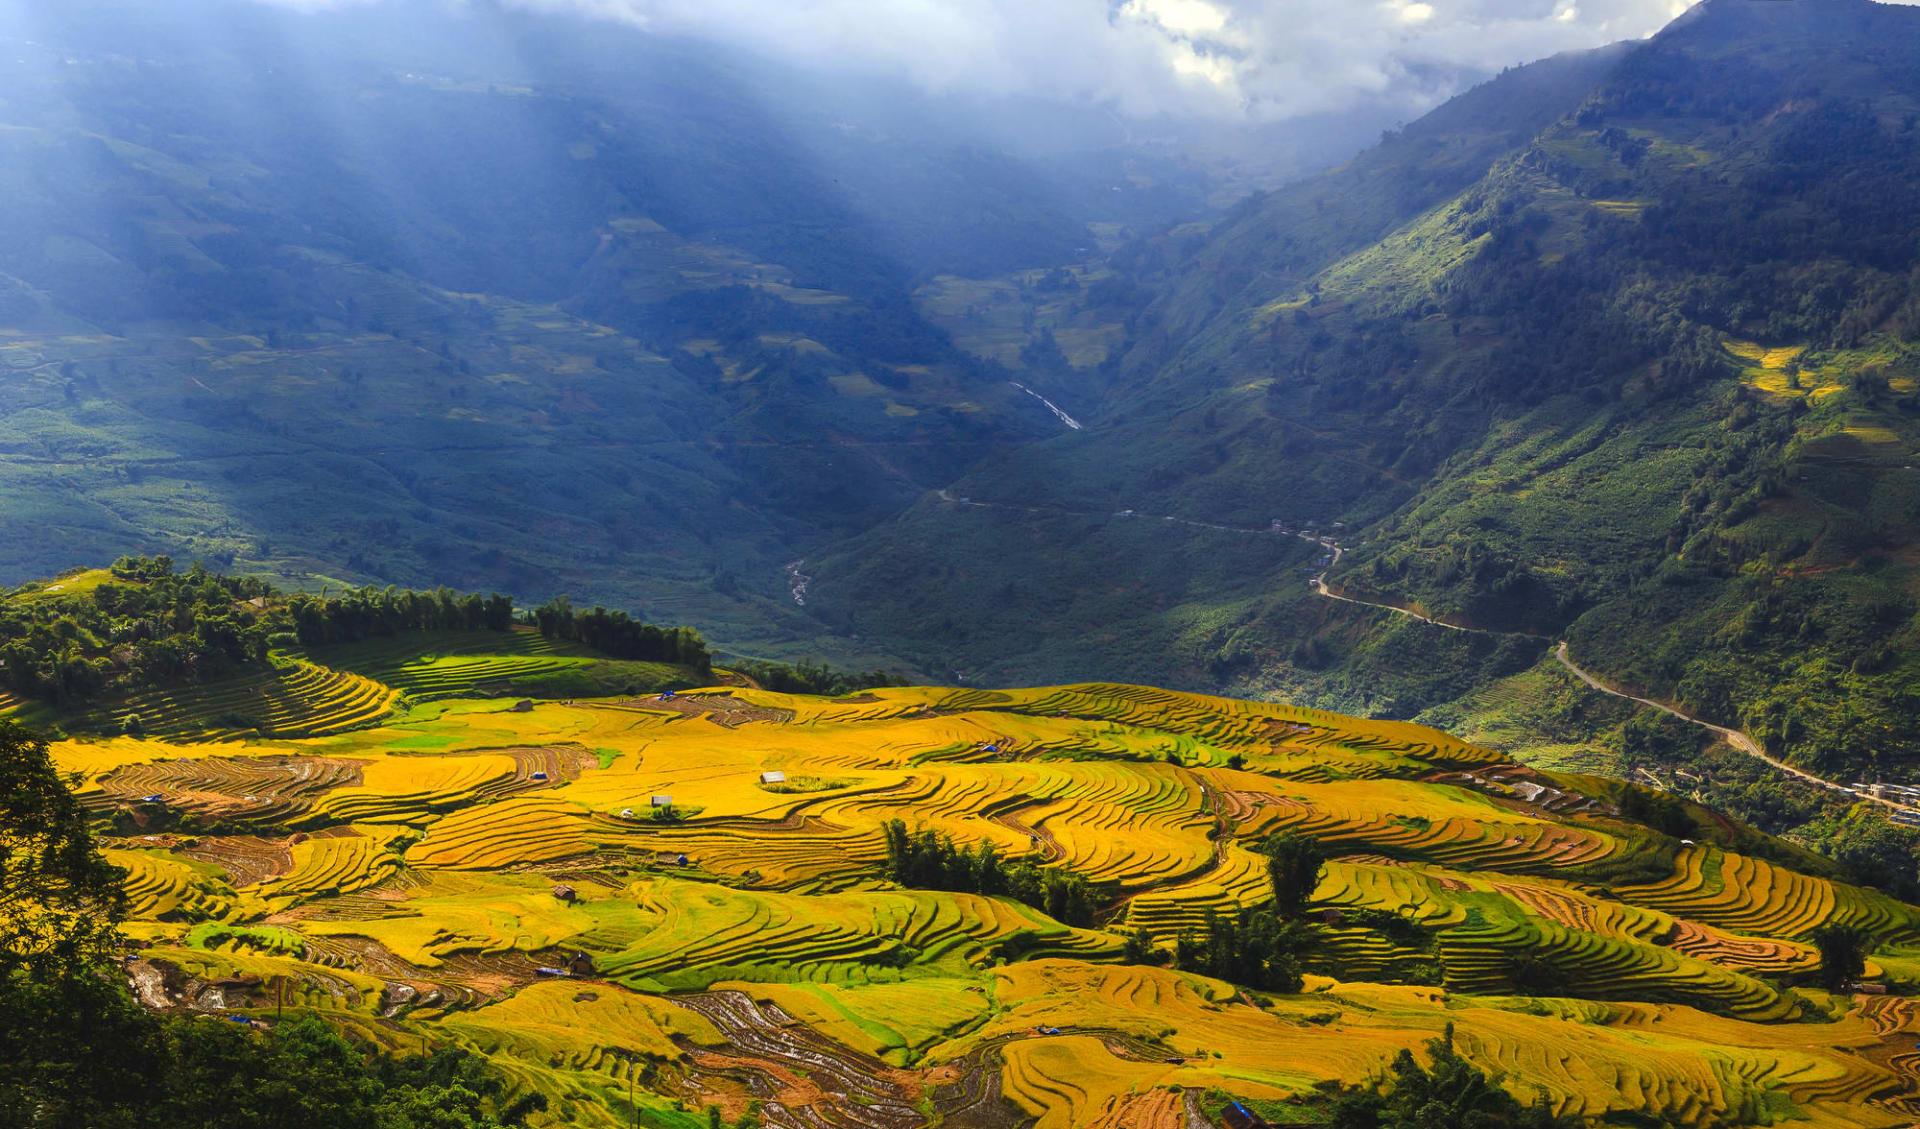 Natur & Kultur rund um Sapa ab Hanoi: Lao Cai: terraced rice fields and rays